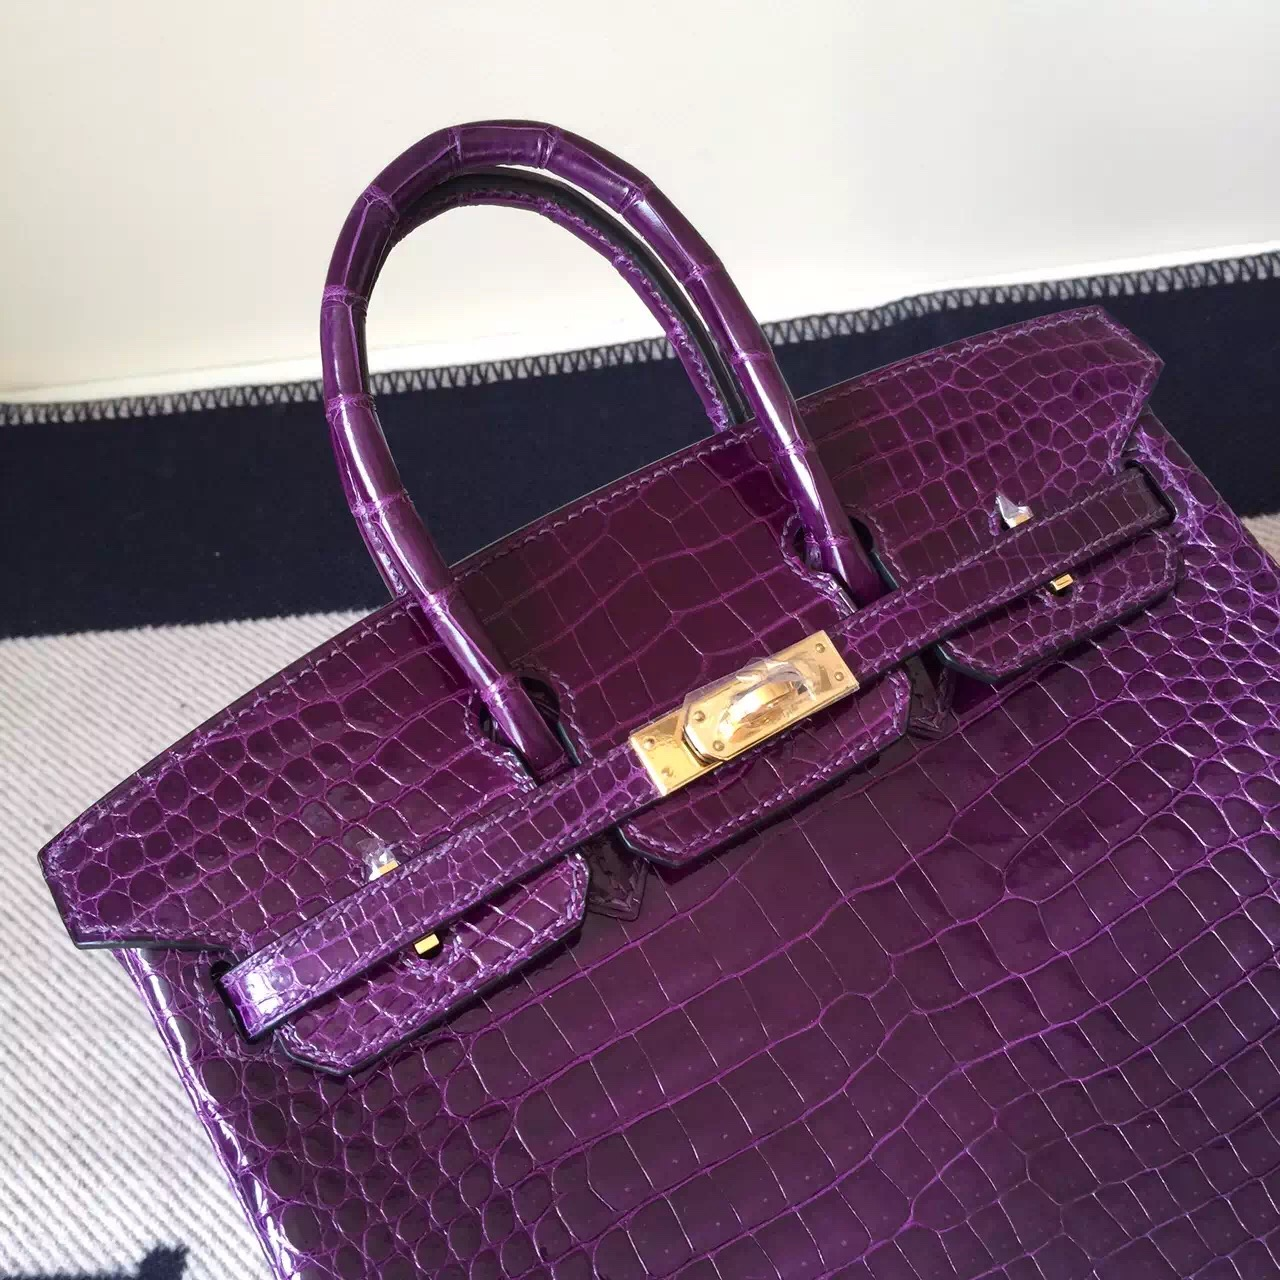 Luxury Hermes Crocodile Leather Birkin Bag 25cm in 9G Violet Gold Hardware